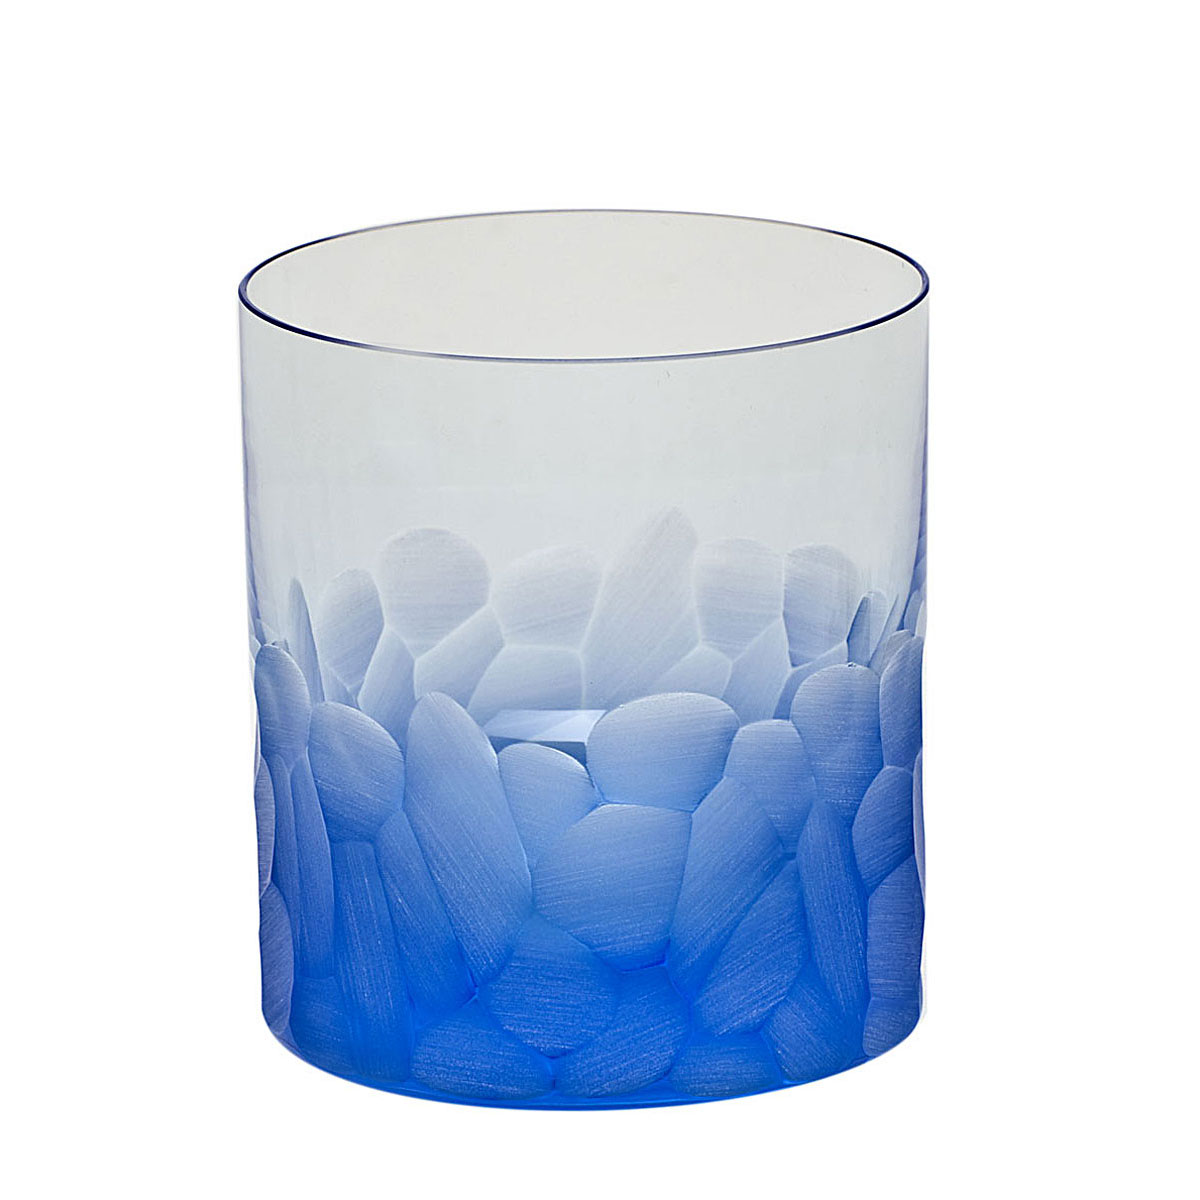 Moser Crystal Pebbles DOF Tumbler, Aquamarine, Single